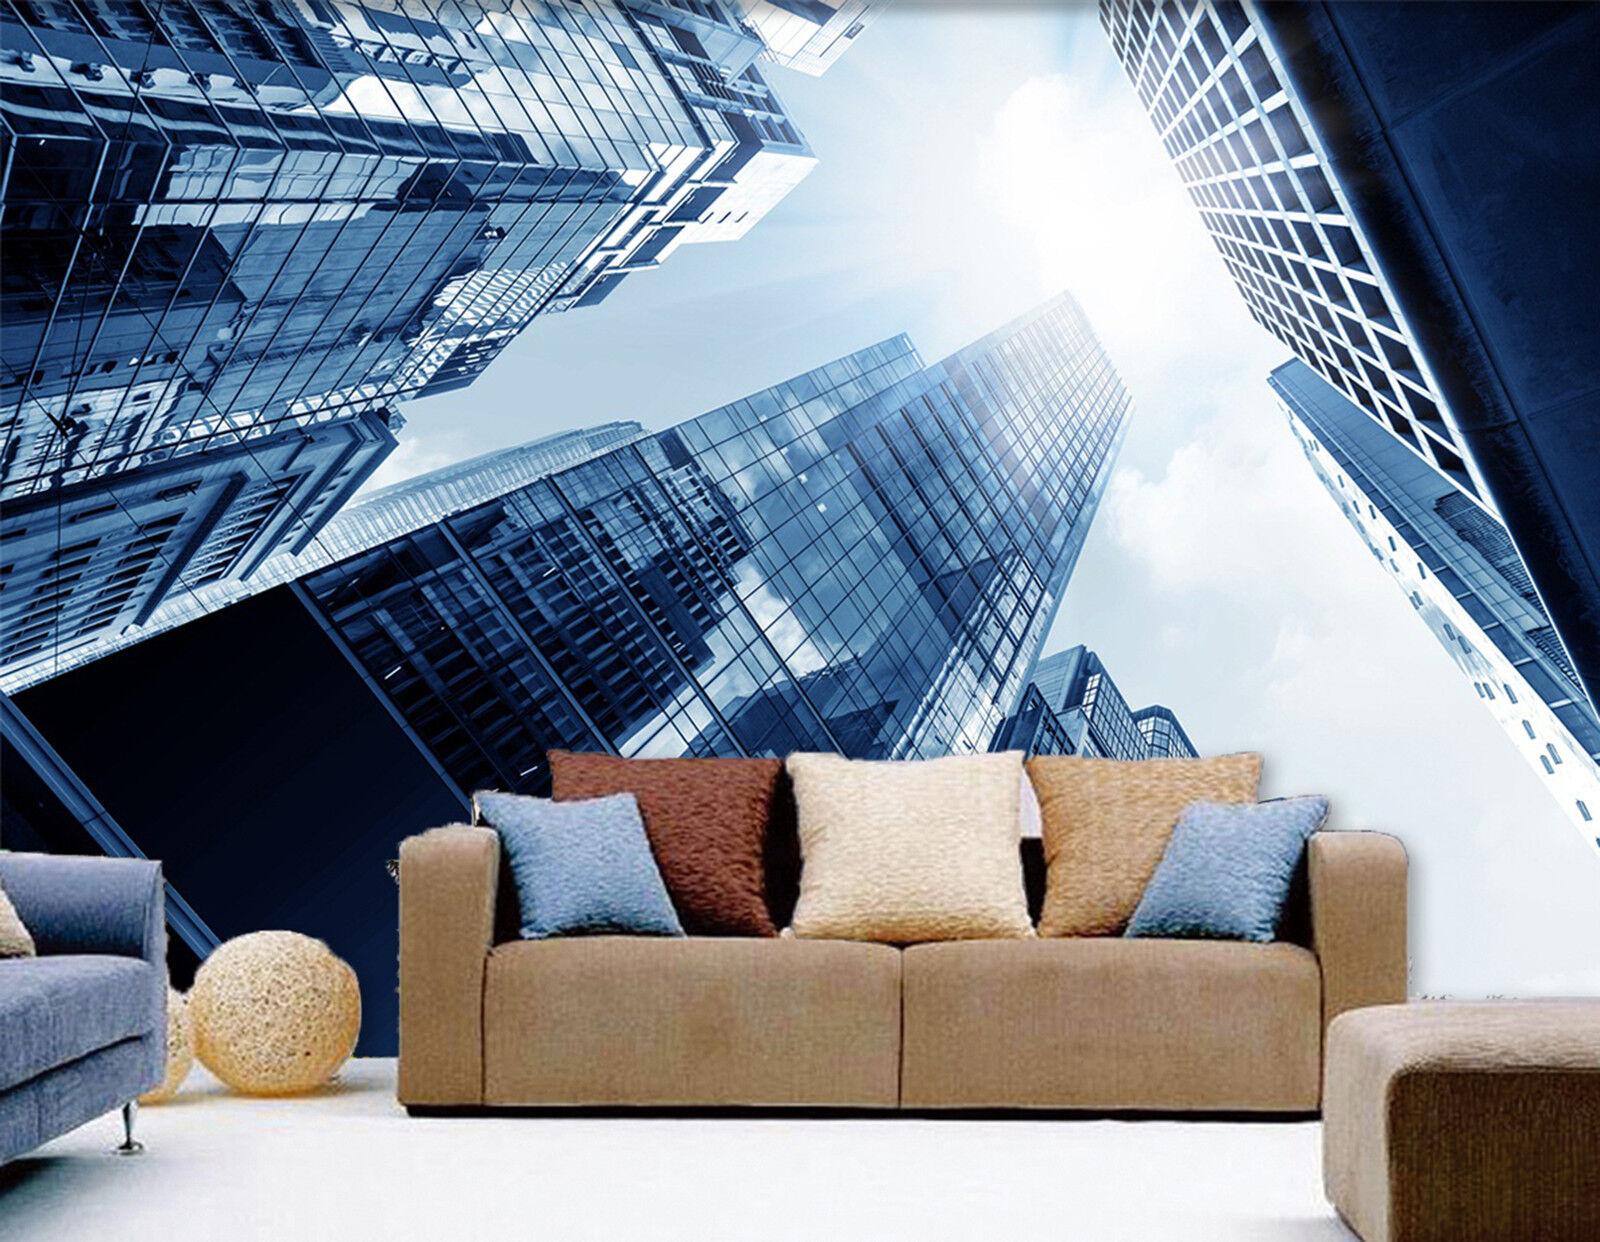 3D Hochhaus  Gebude Fototapeten Wandbild Fototapete Bild Tapete Familie Kinder